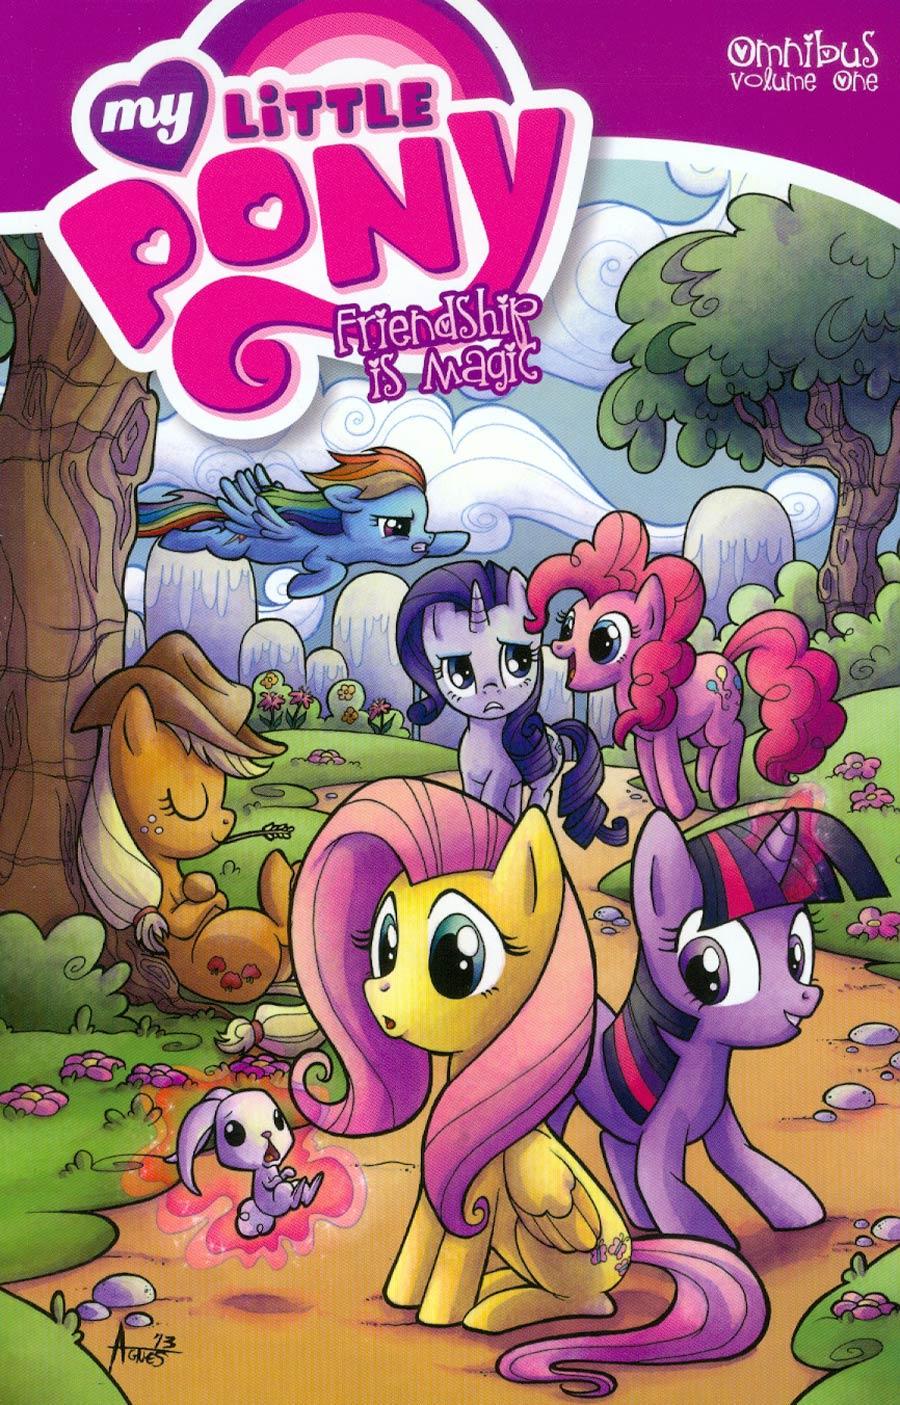 My Little Pony Friendship Is Magic Omnibus Vol 1 TP